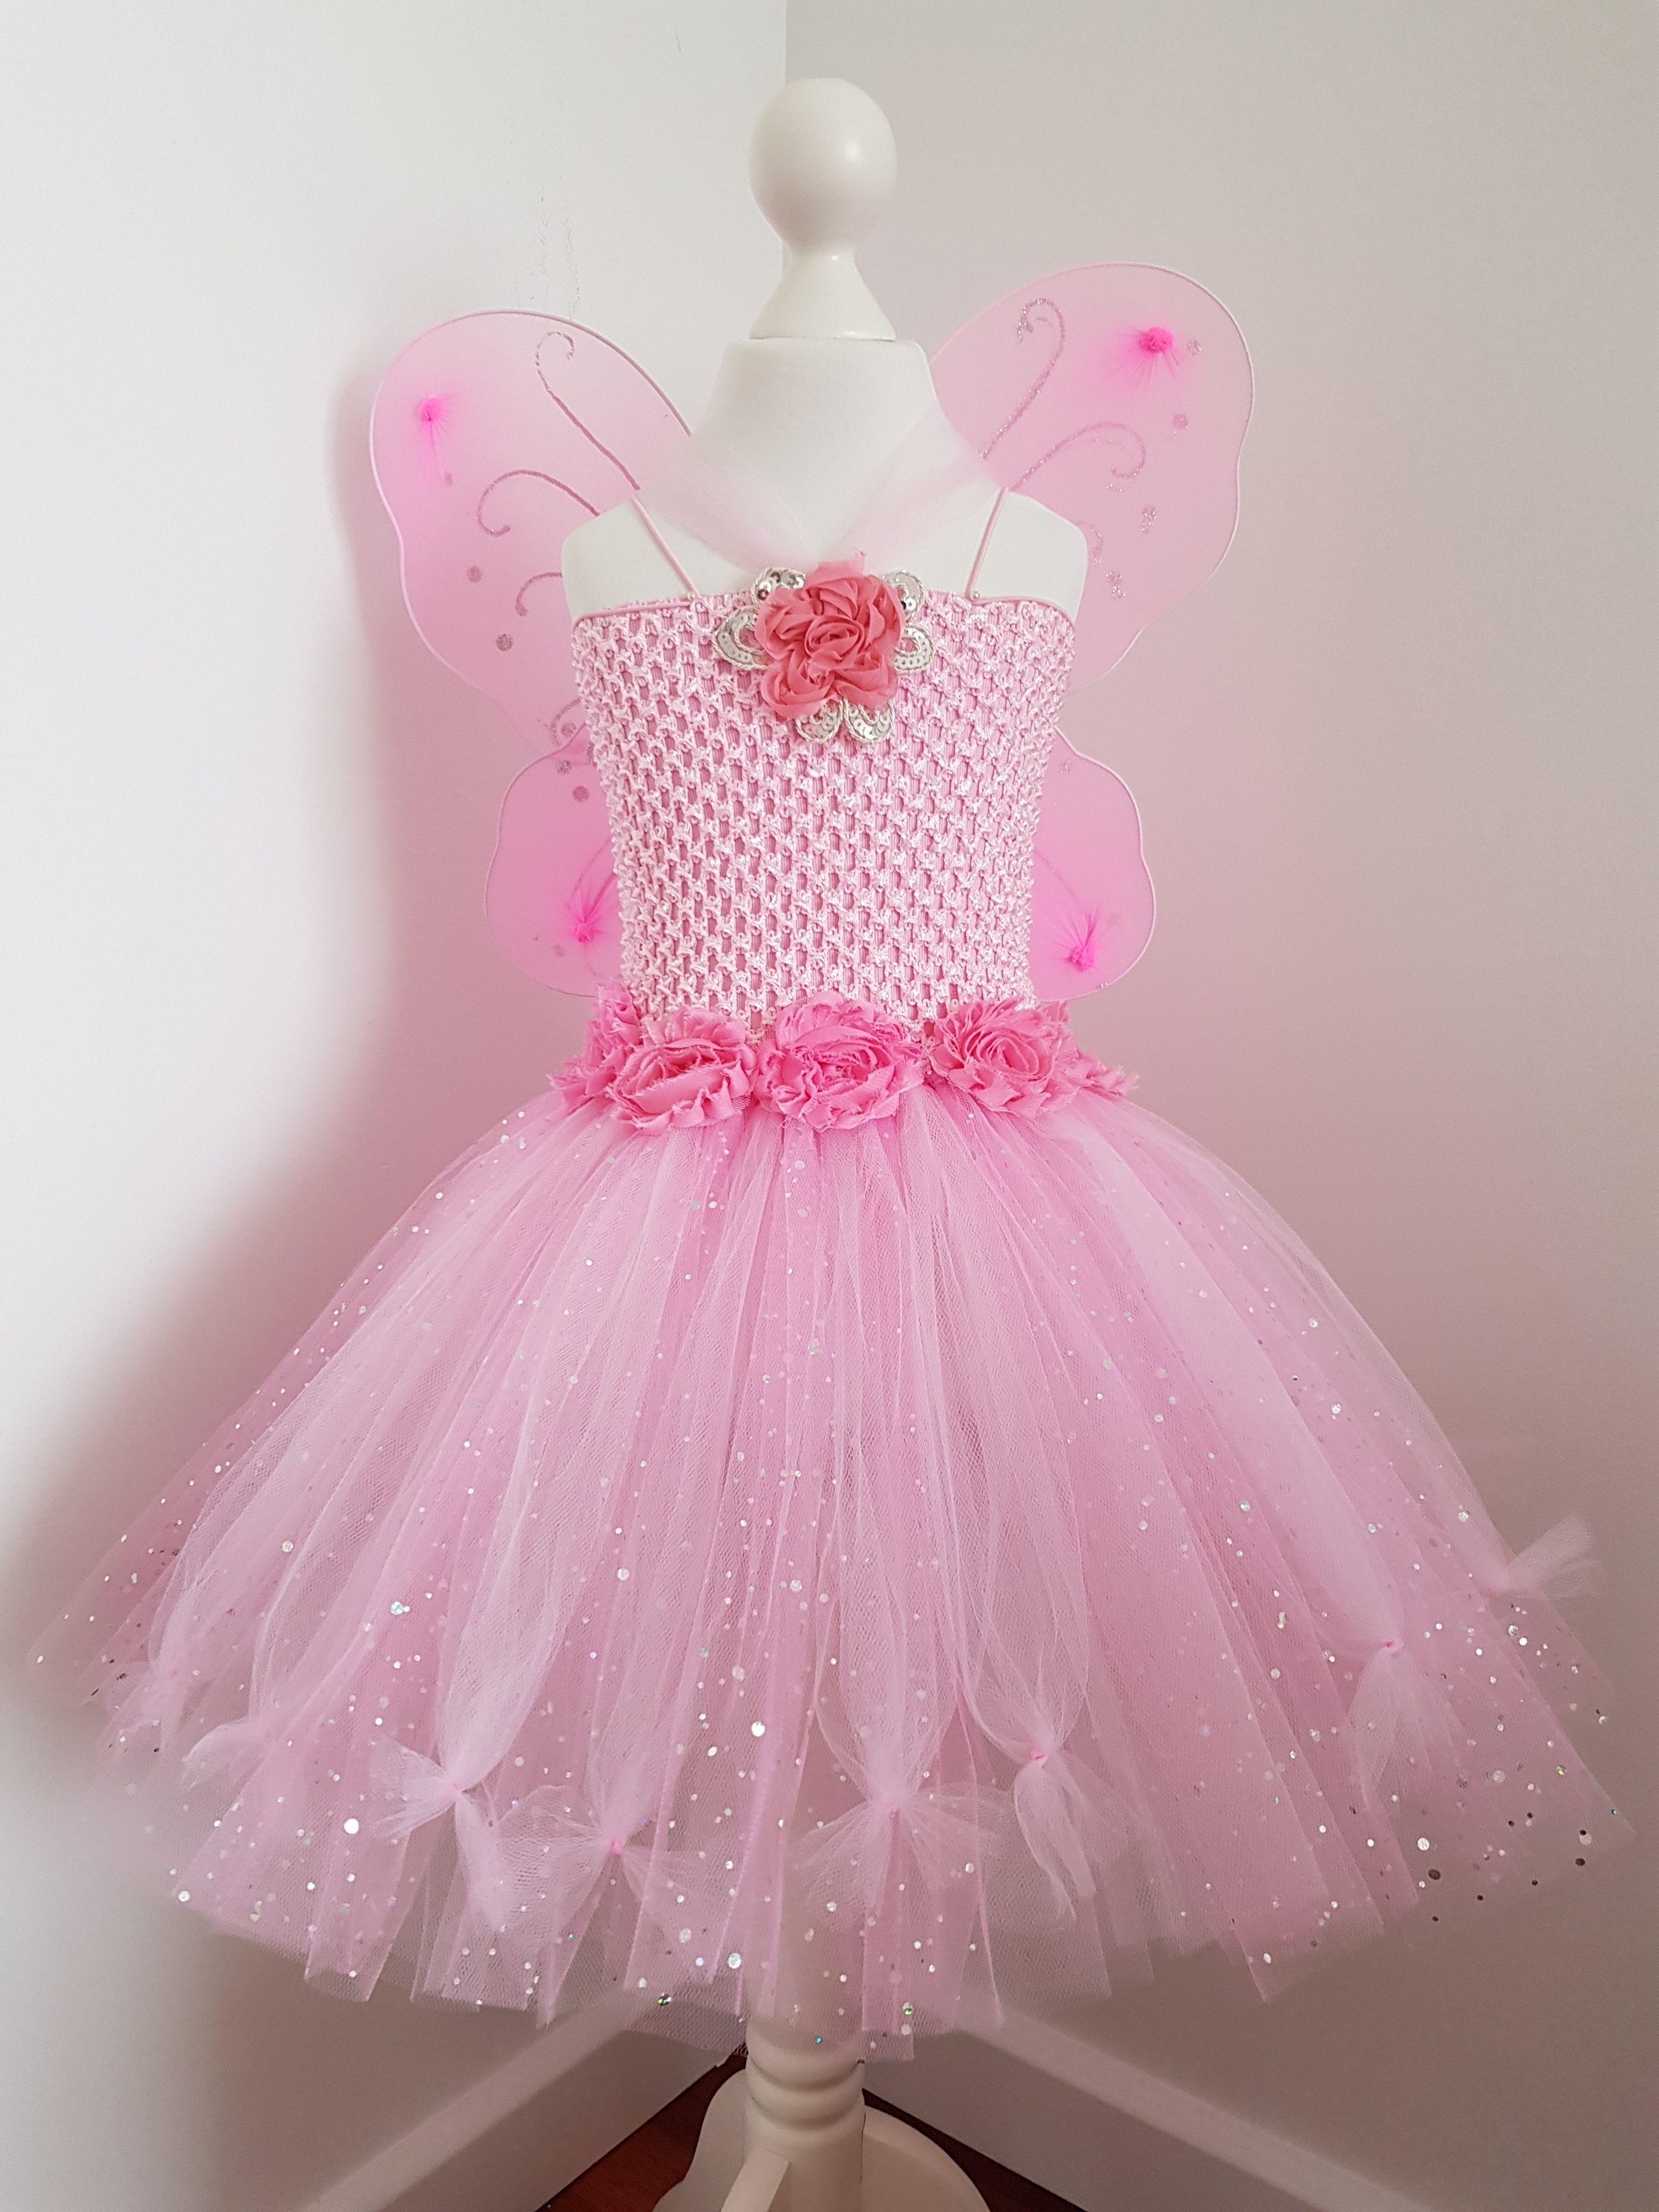 Fairy Tutu Dress 7 to 7 years old  Tutu dress, Dresses, Flower